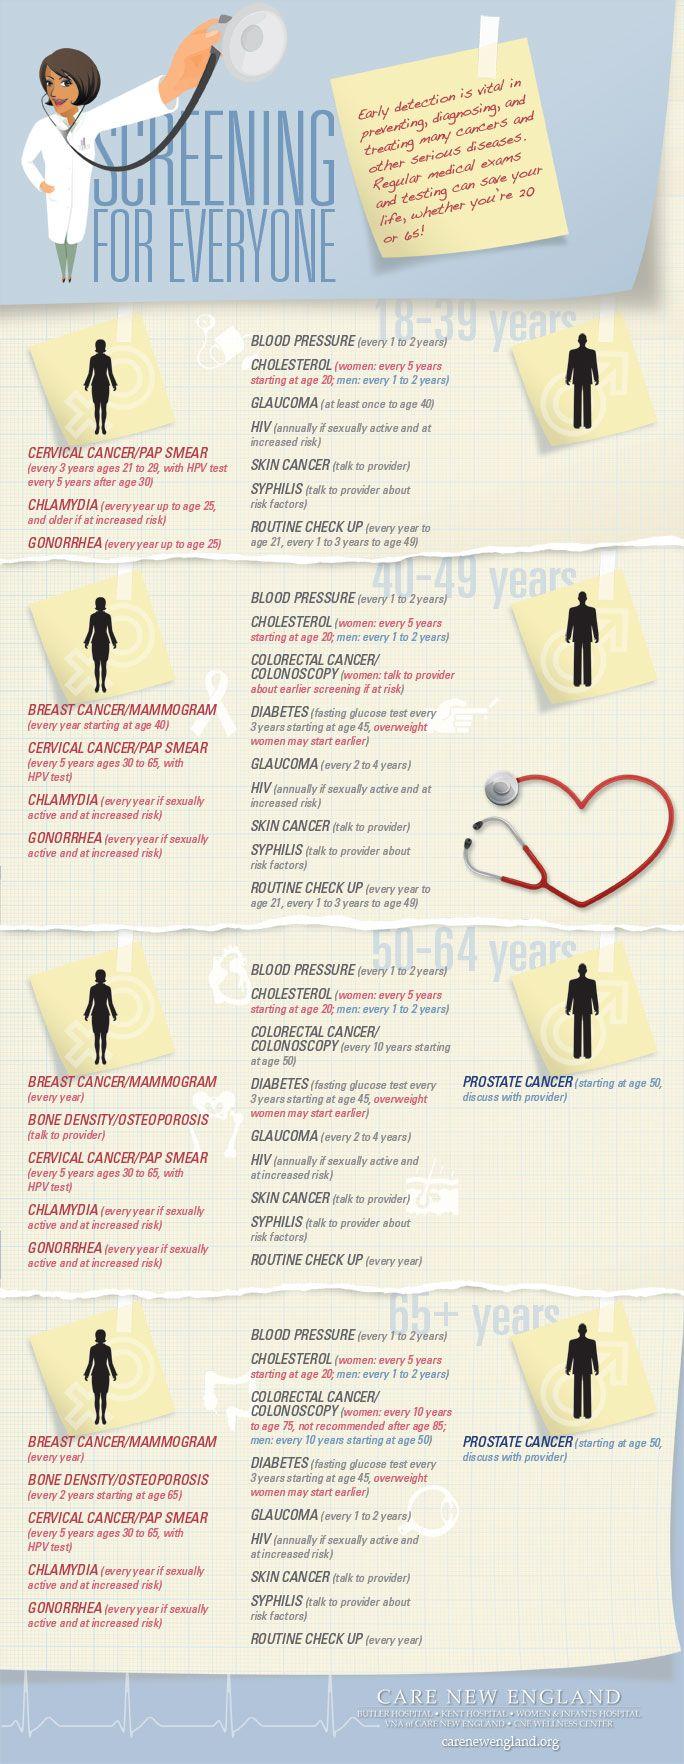 Health Screenings